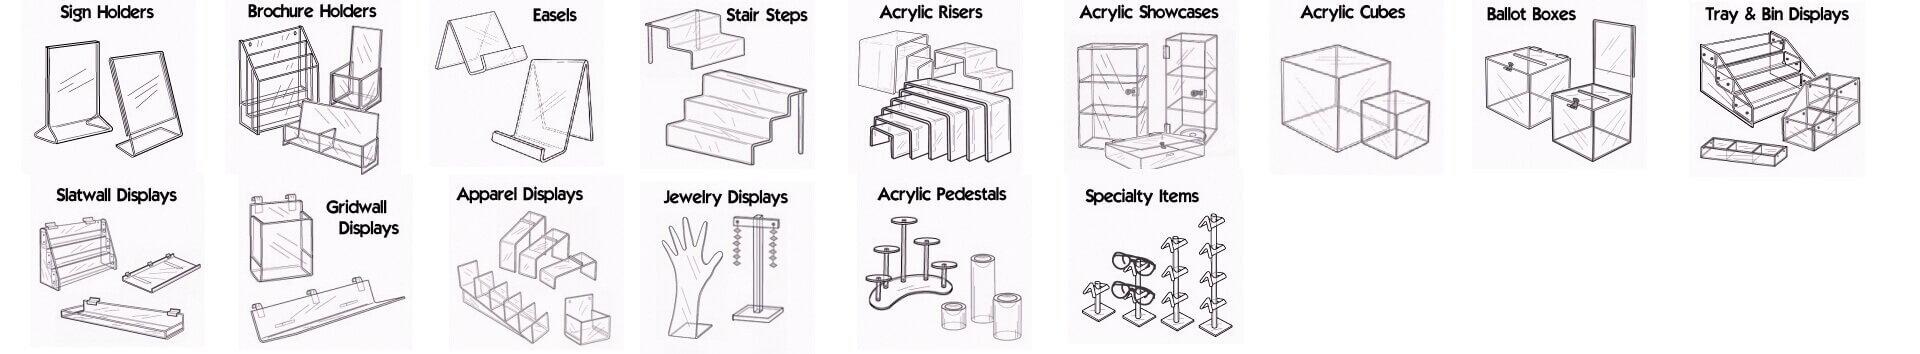 Models of Acrylic Displays